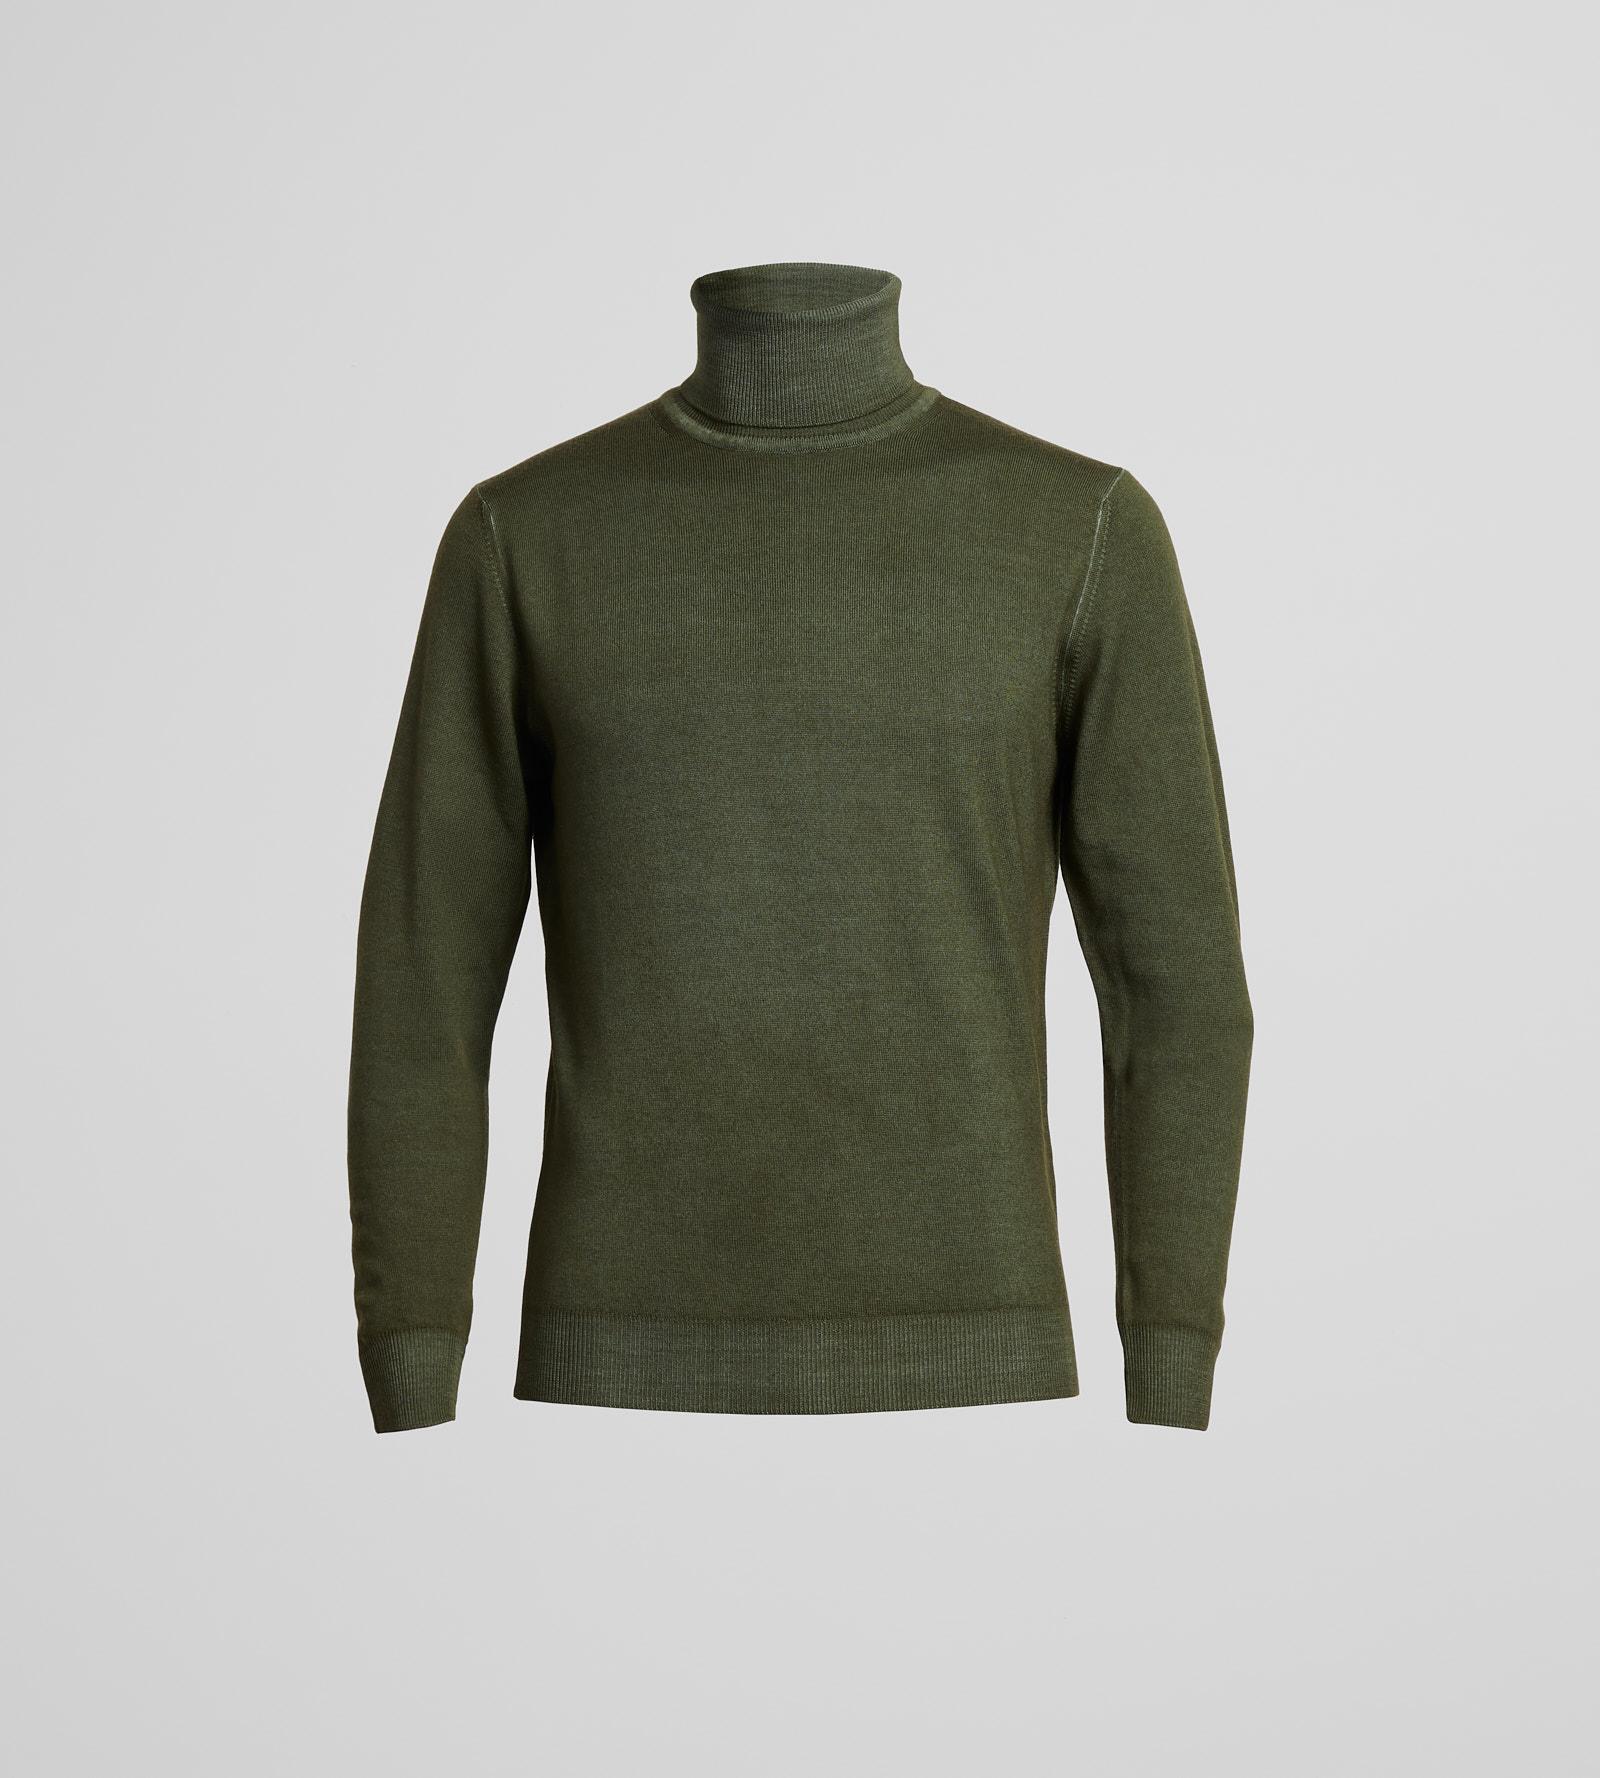 digel-zold-modern-fit-garbo-nyaku-gyapju-pulover-francis1-1-1288001-52